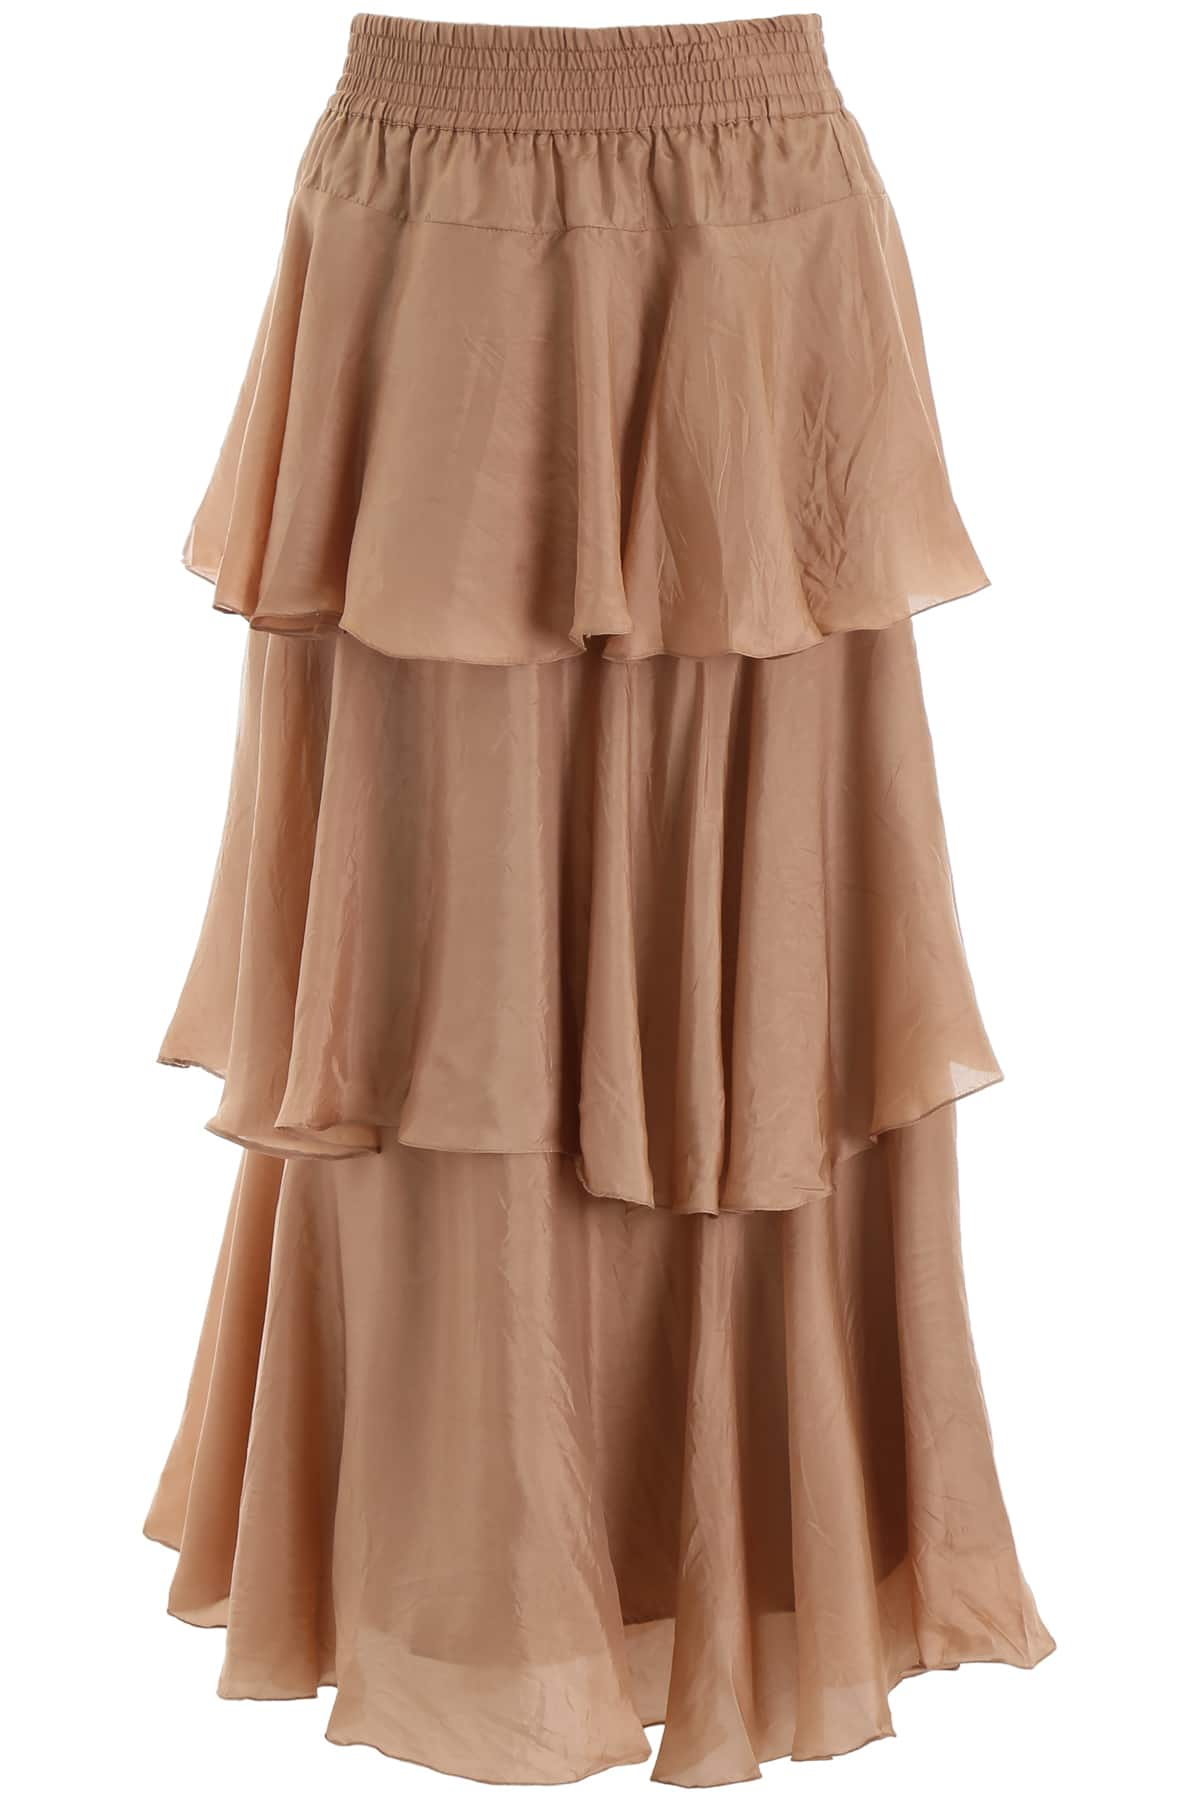 MES DEMOISELLES MEDUSA SKIRT 38 Pink, Beige Silk